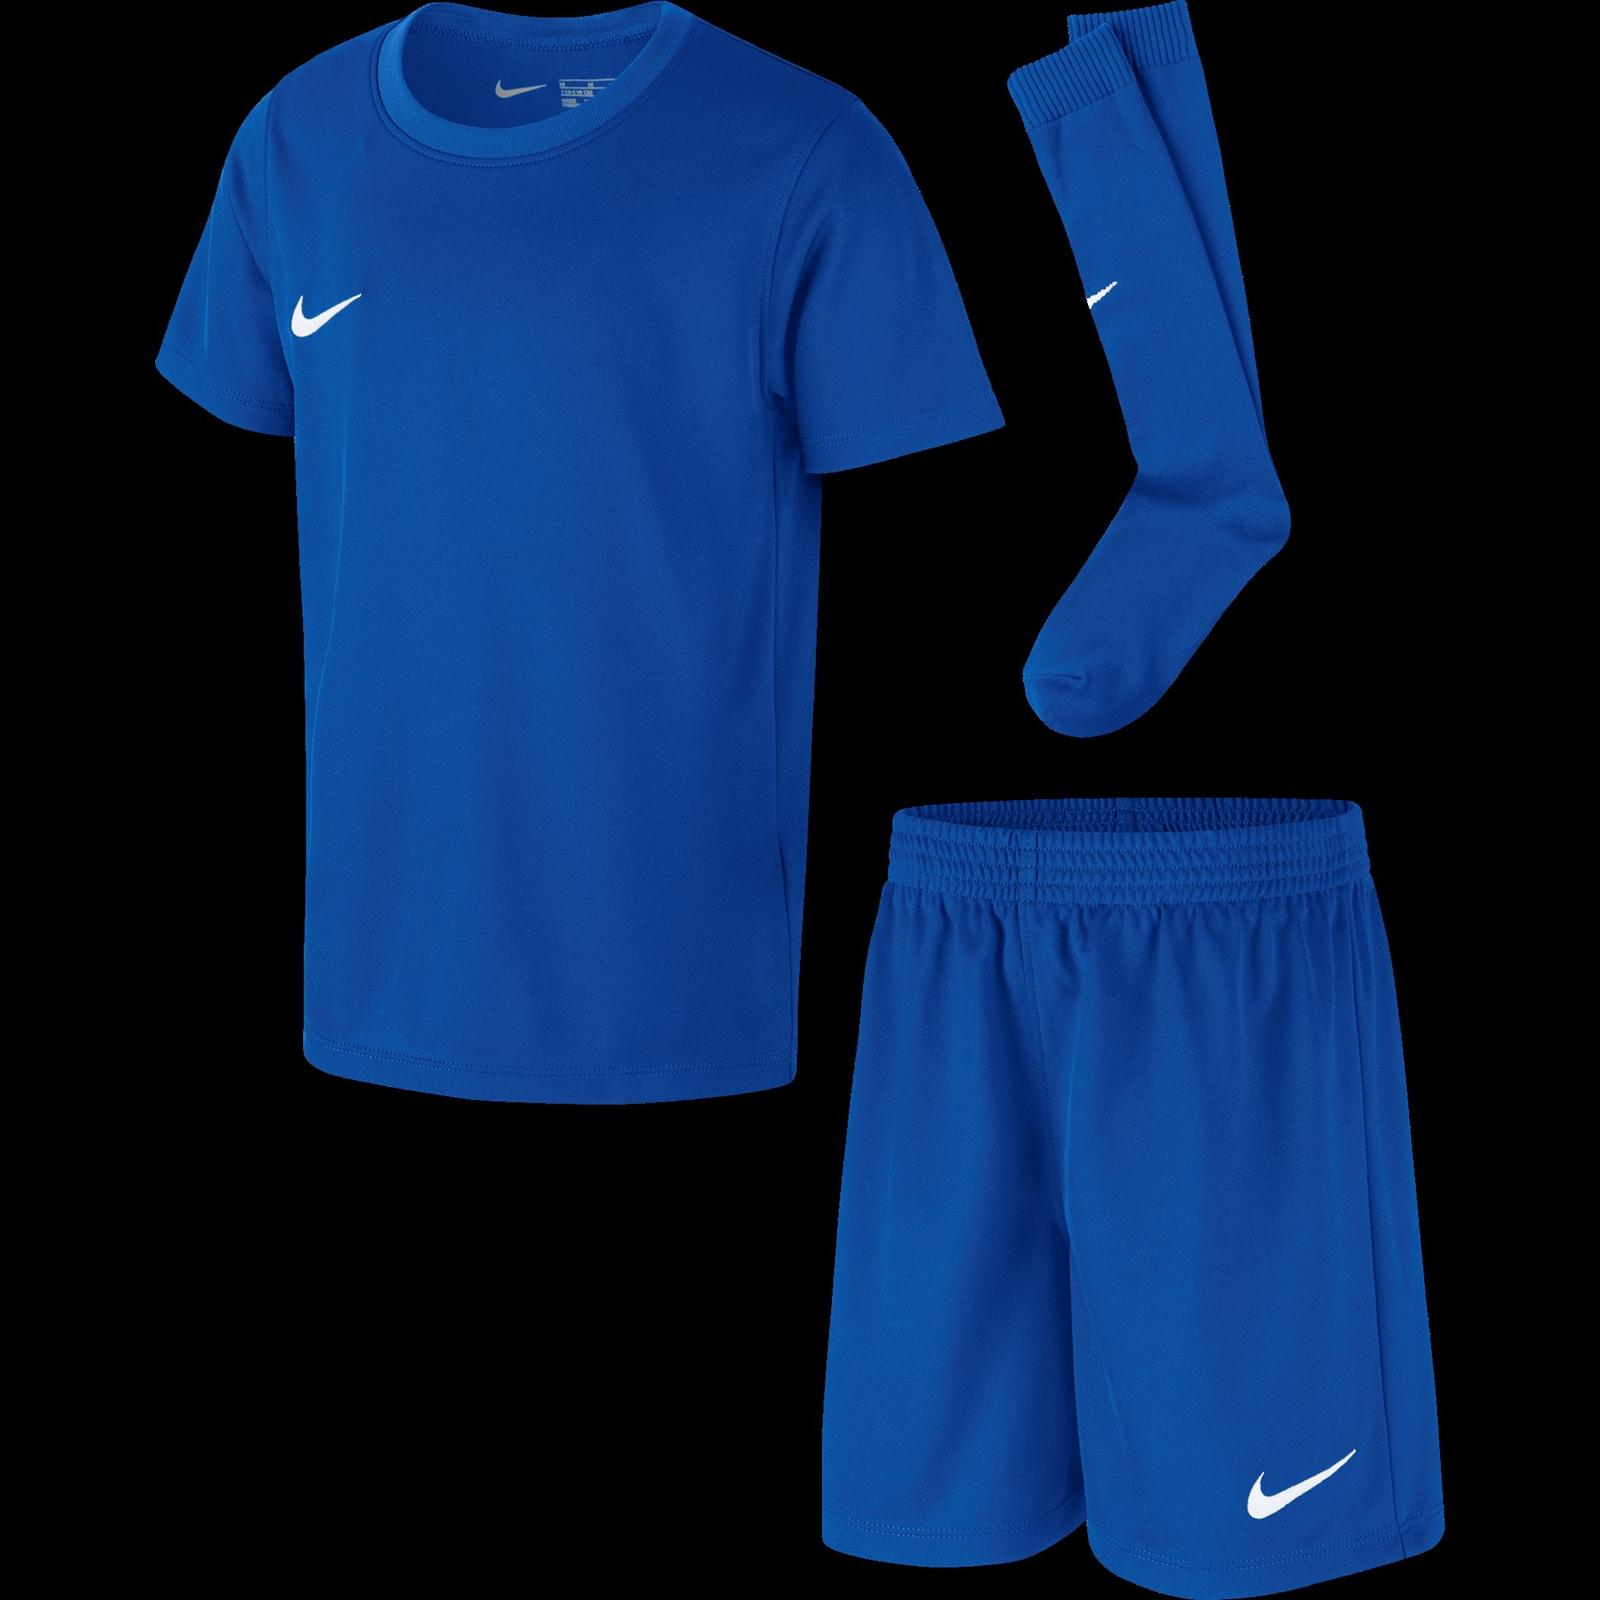 Nike Park Derby Kit Blue   White 23-24in  9540f1101678